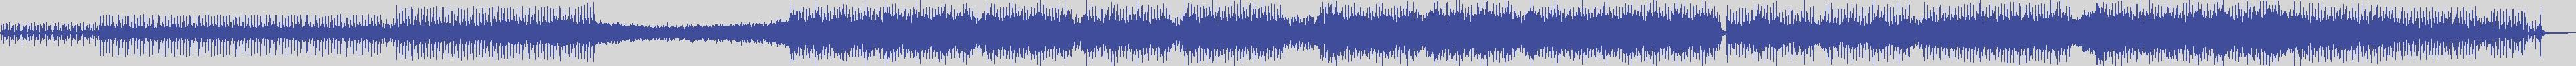 just_digital_records [JS1406] Sugar Freak - Music Change My Life [Angeless Club Mix] audio wave form